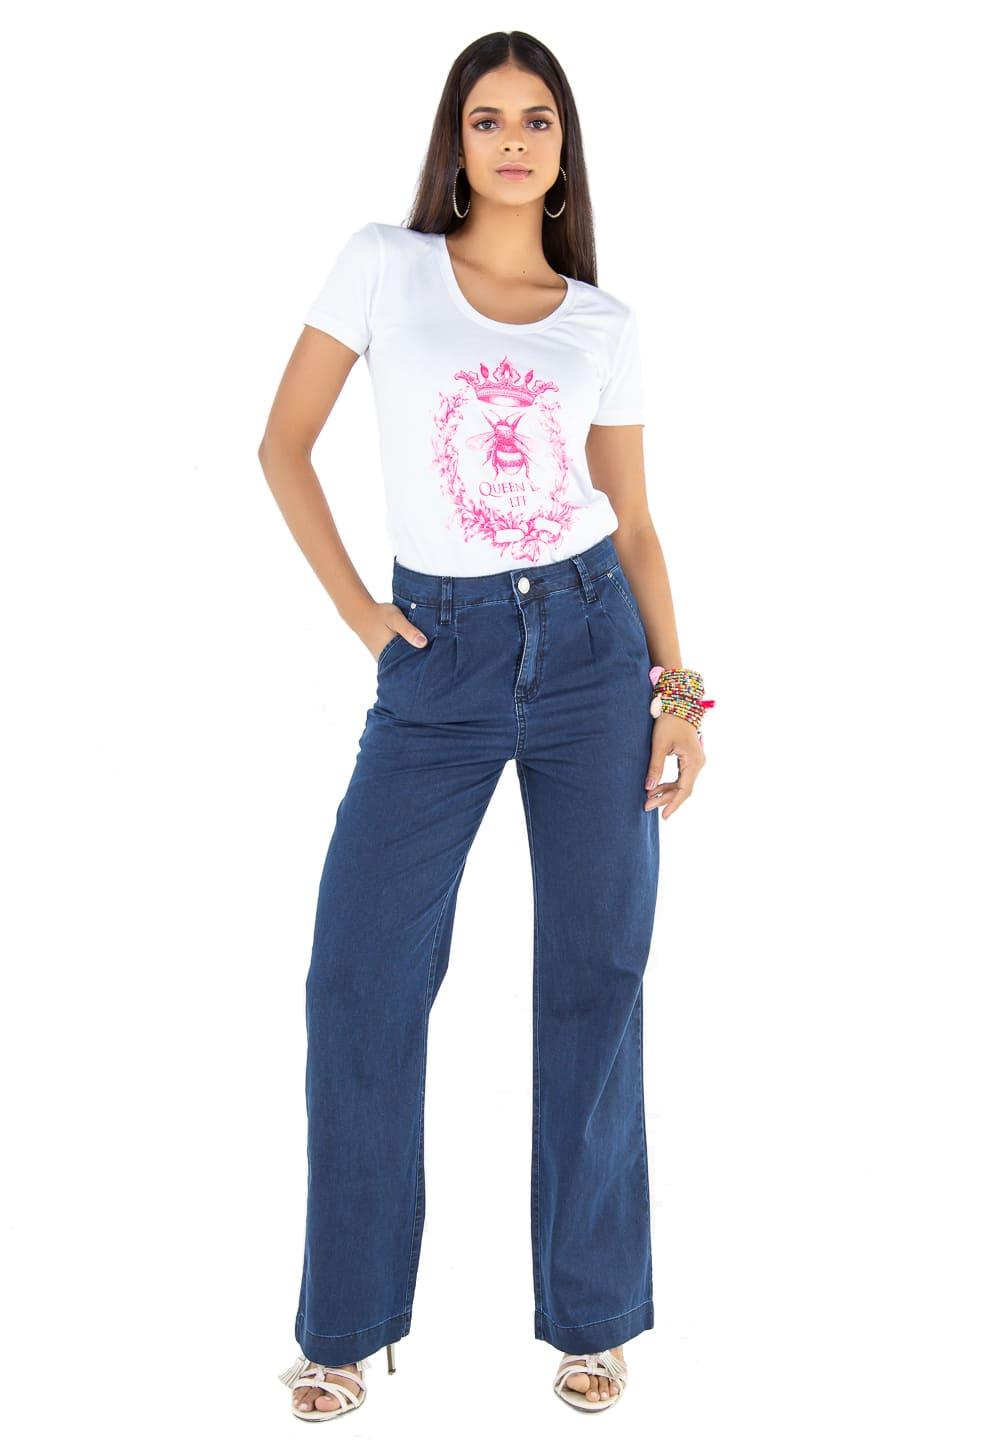 Calça Jeans Feminina Latifundio Pantalona